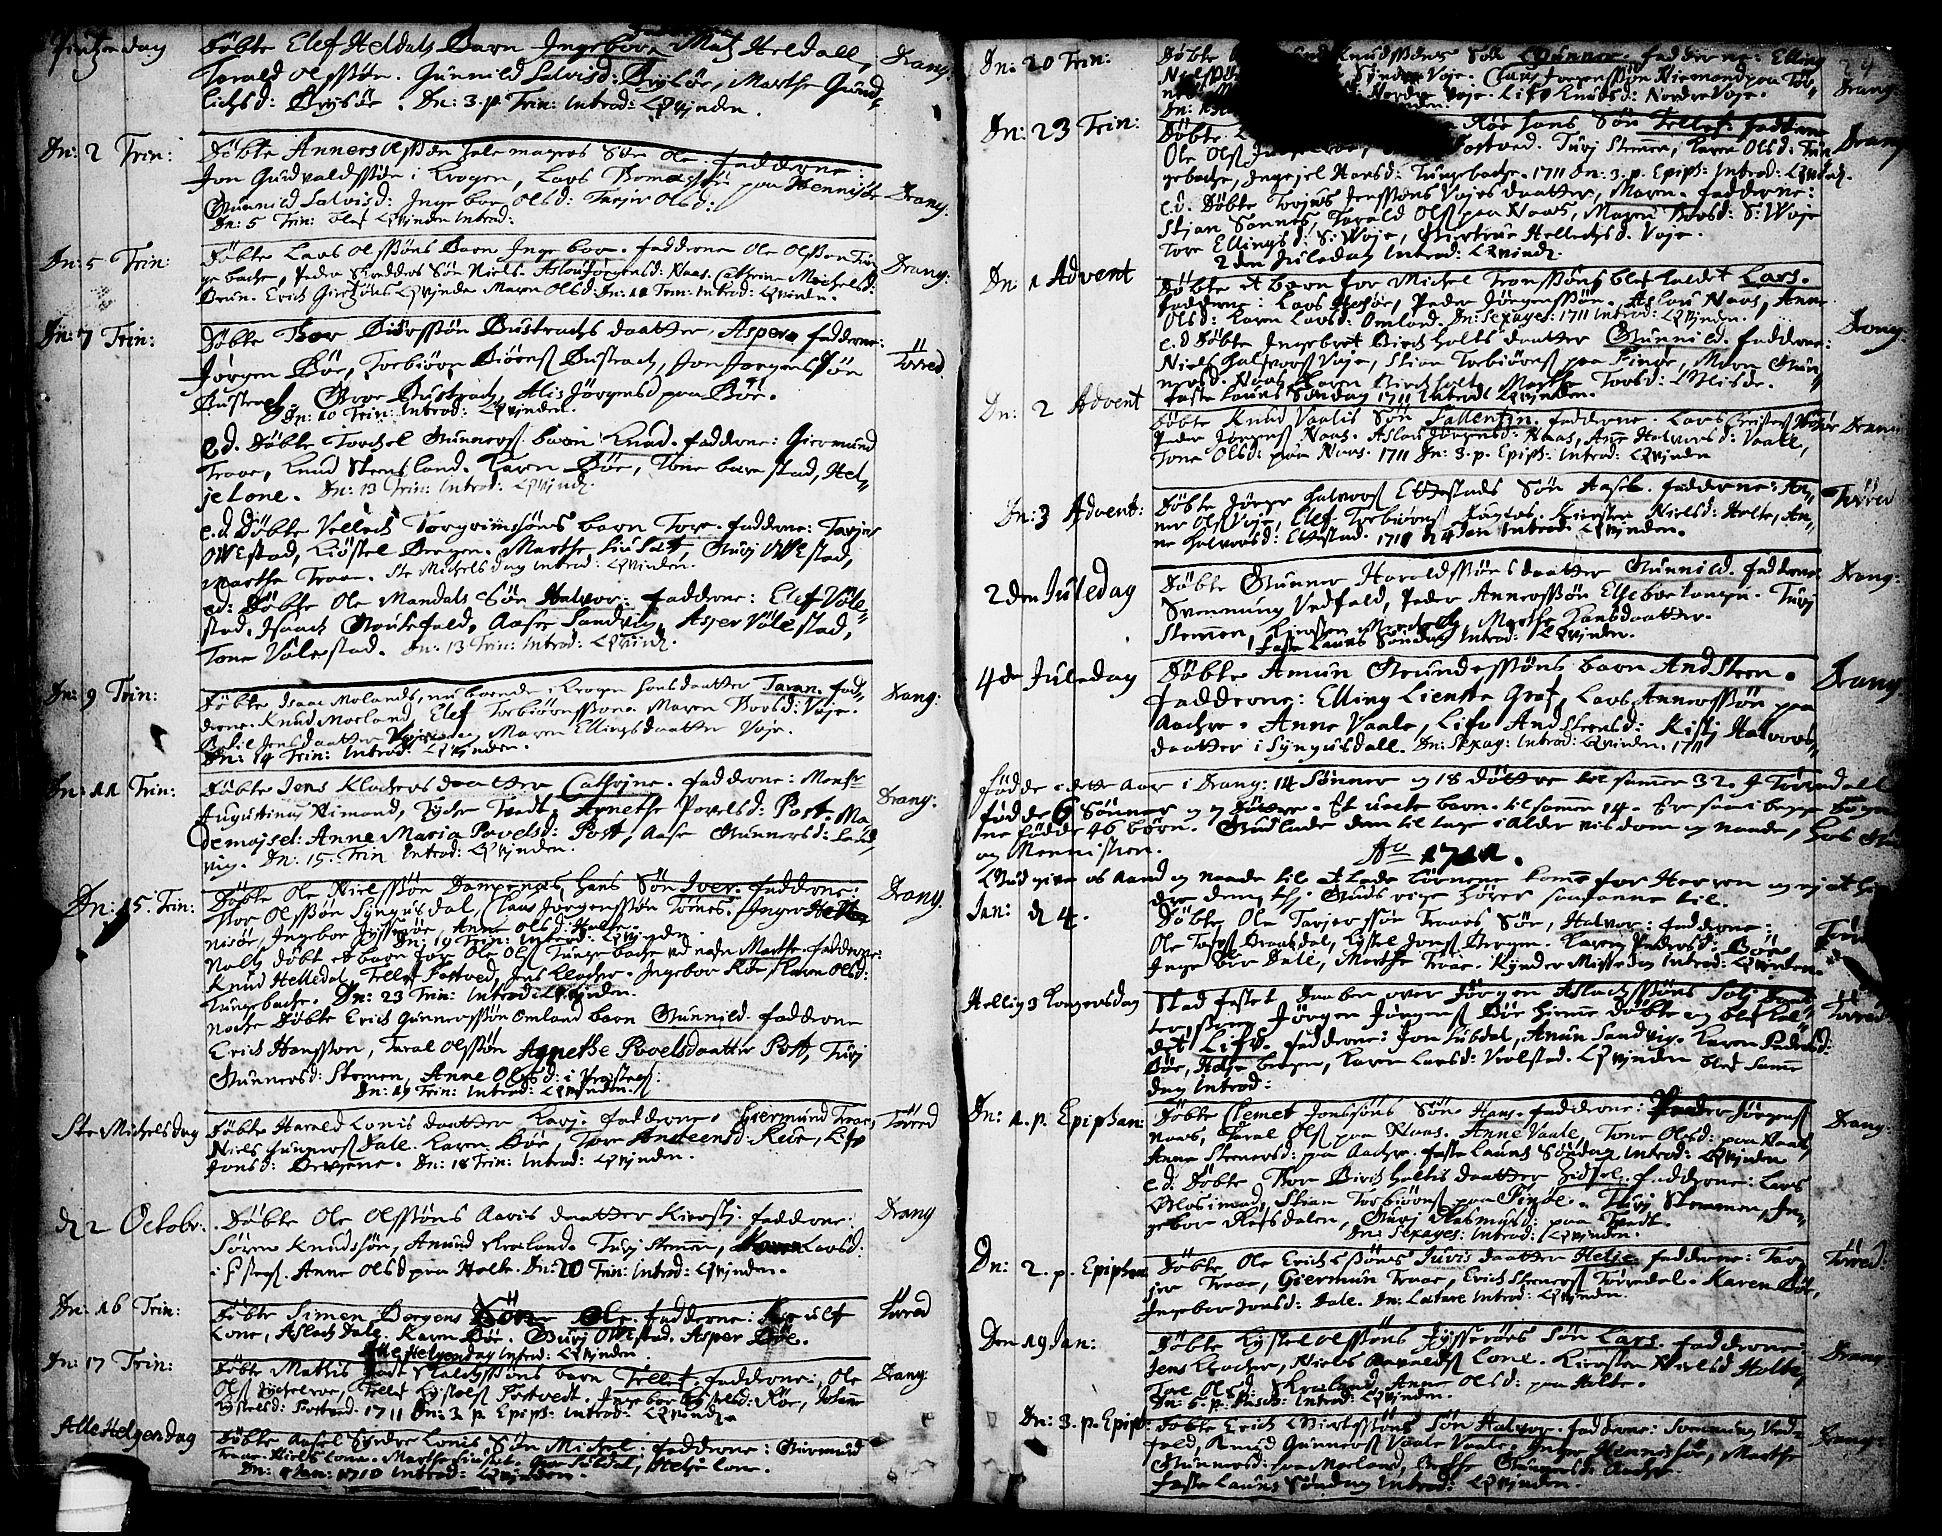 SAKO, Drangedal kirkebøker, F/Fa/L0001: Ministerialbok nr. 1, 1697-1767, s. 24